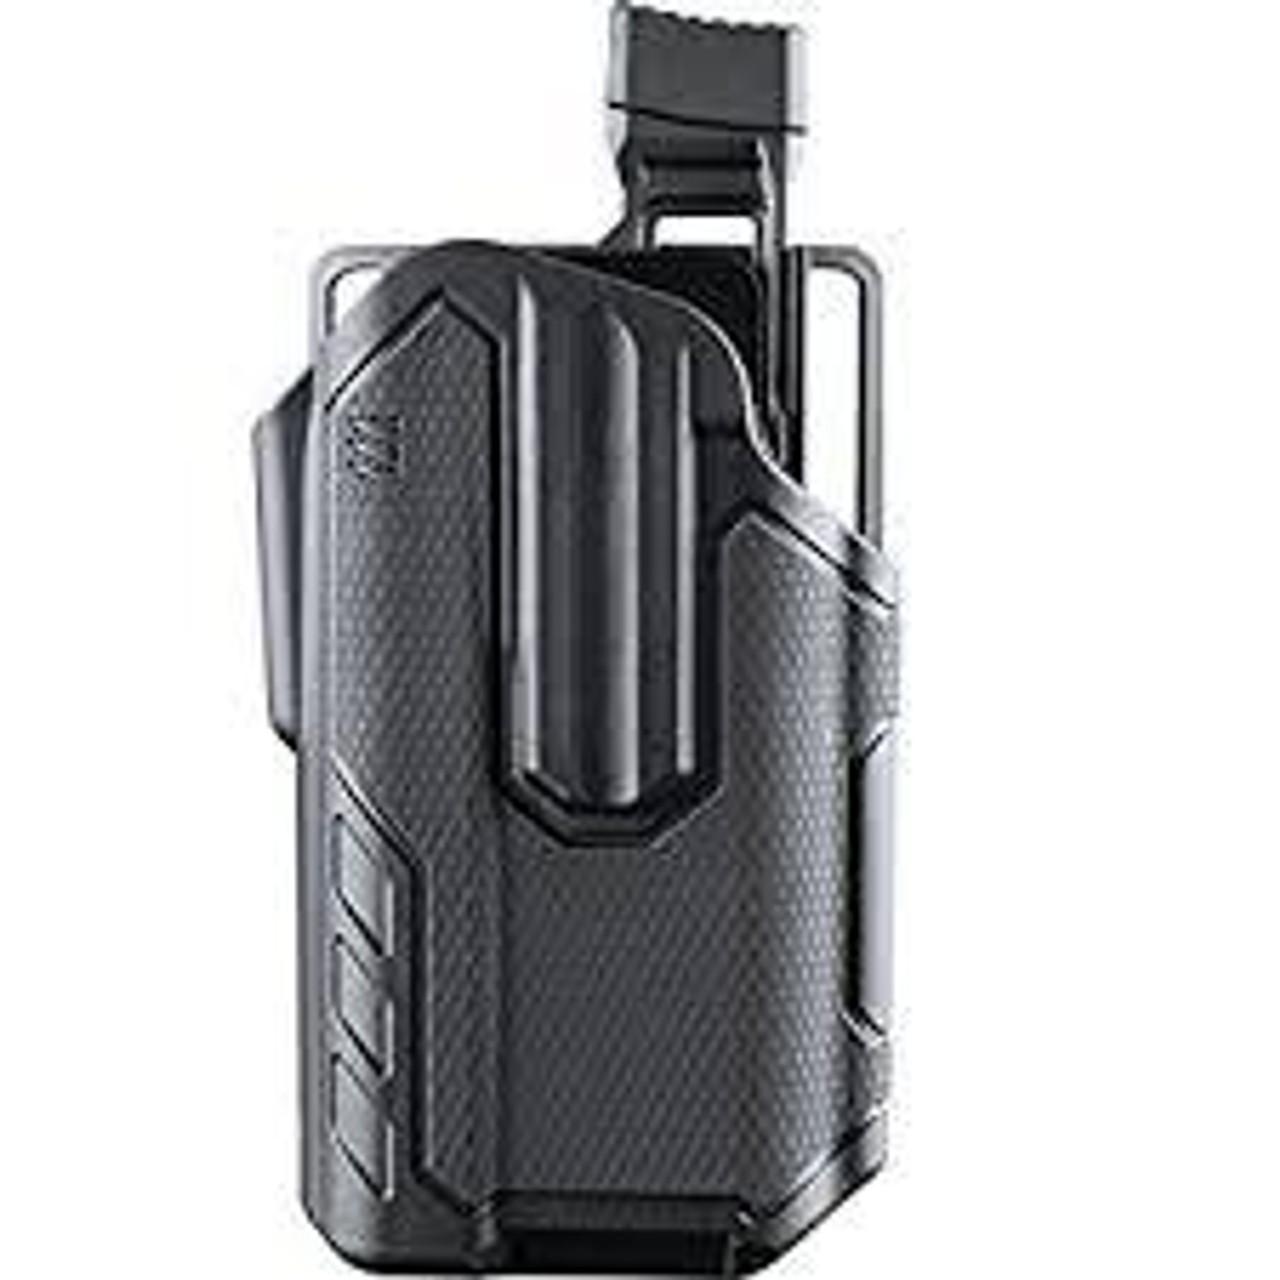 BLACKHAWK - Omnivore Multi fit Holster for Most Handguns with Surefire X-300 Light Grey/Black